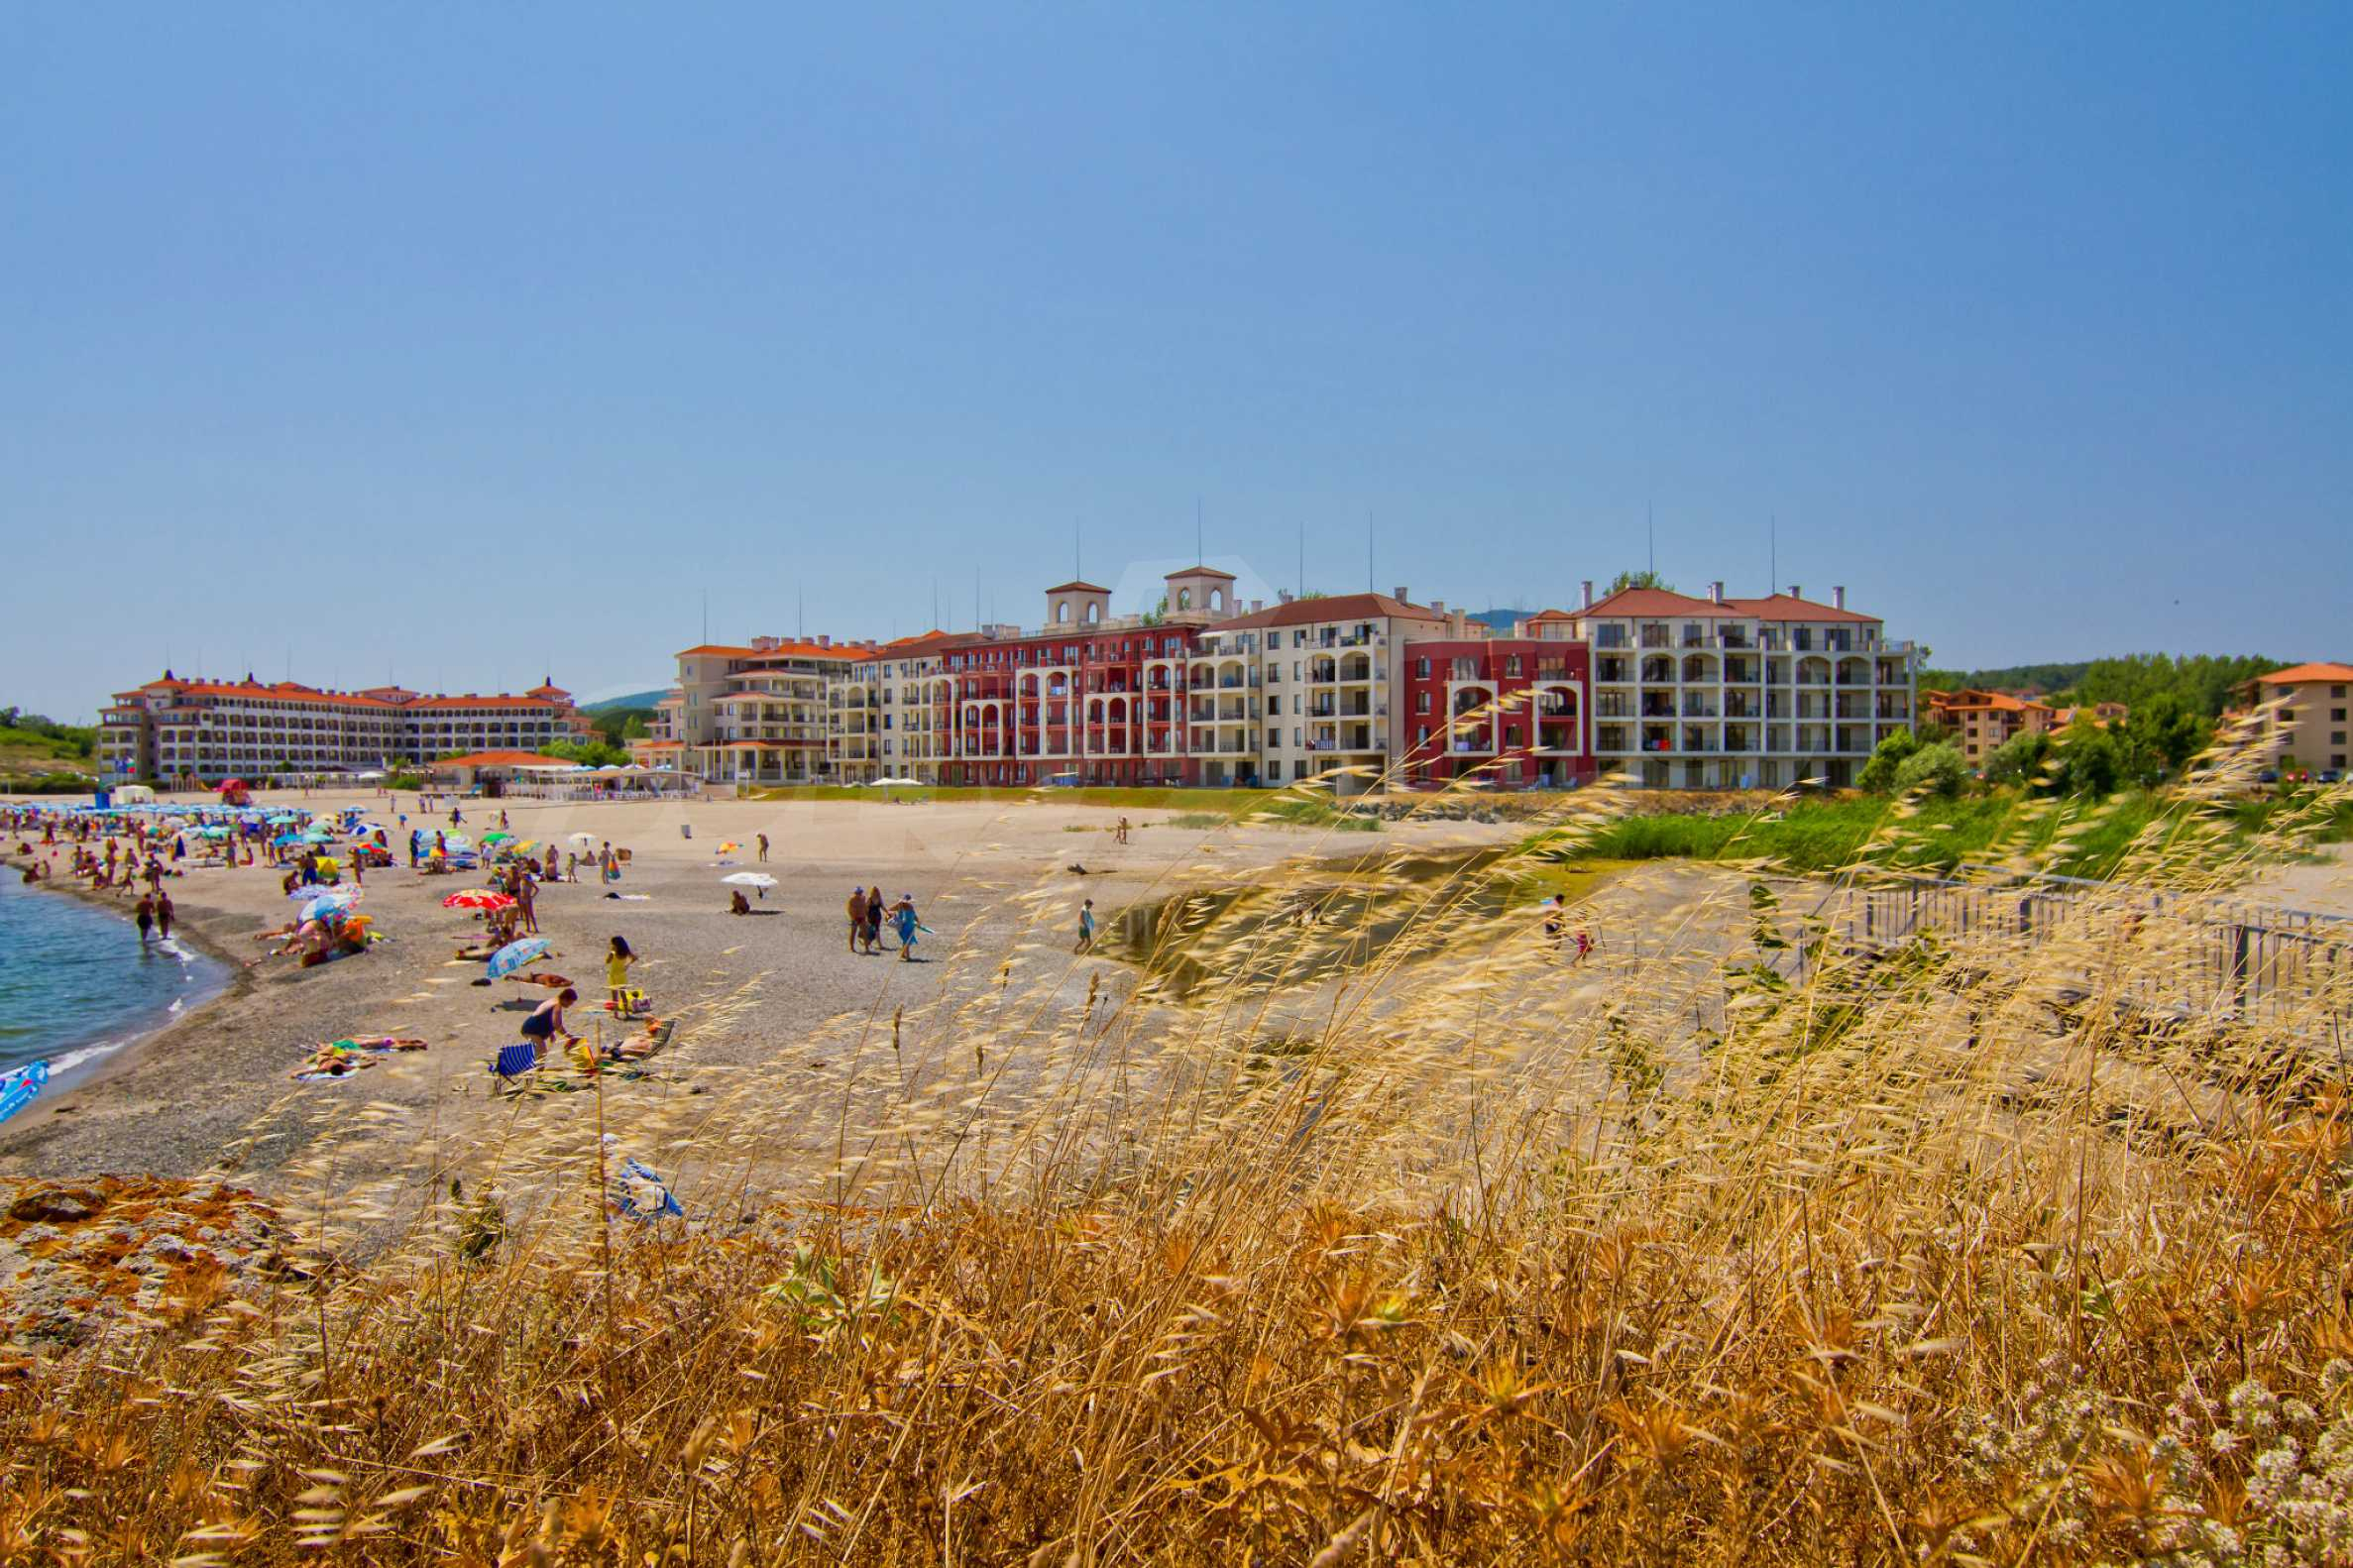 Примеа Бийч Резиденс / Primea Beach Residence 19